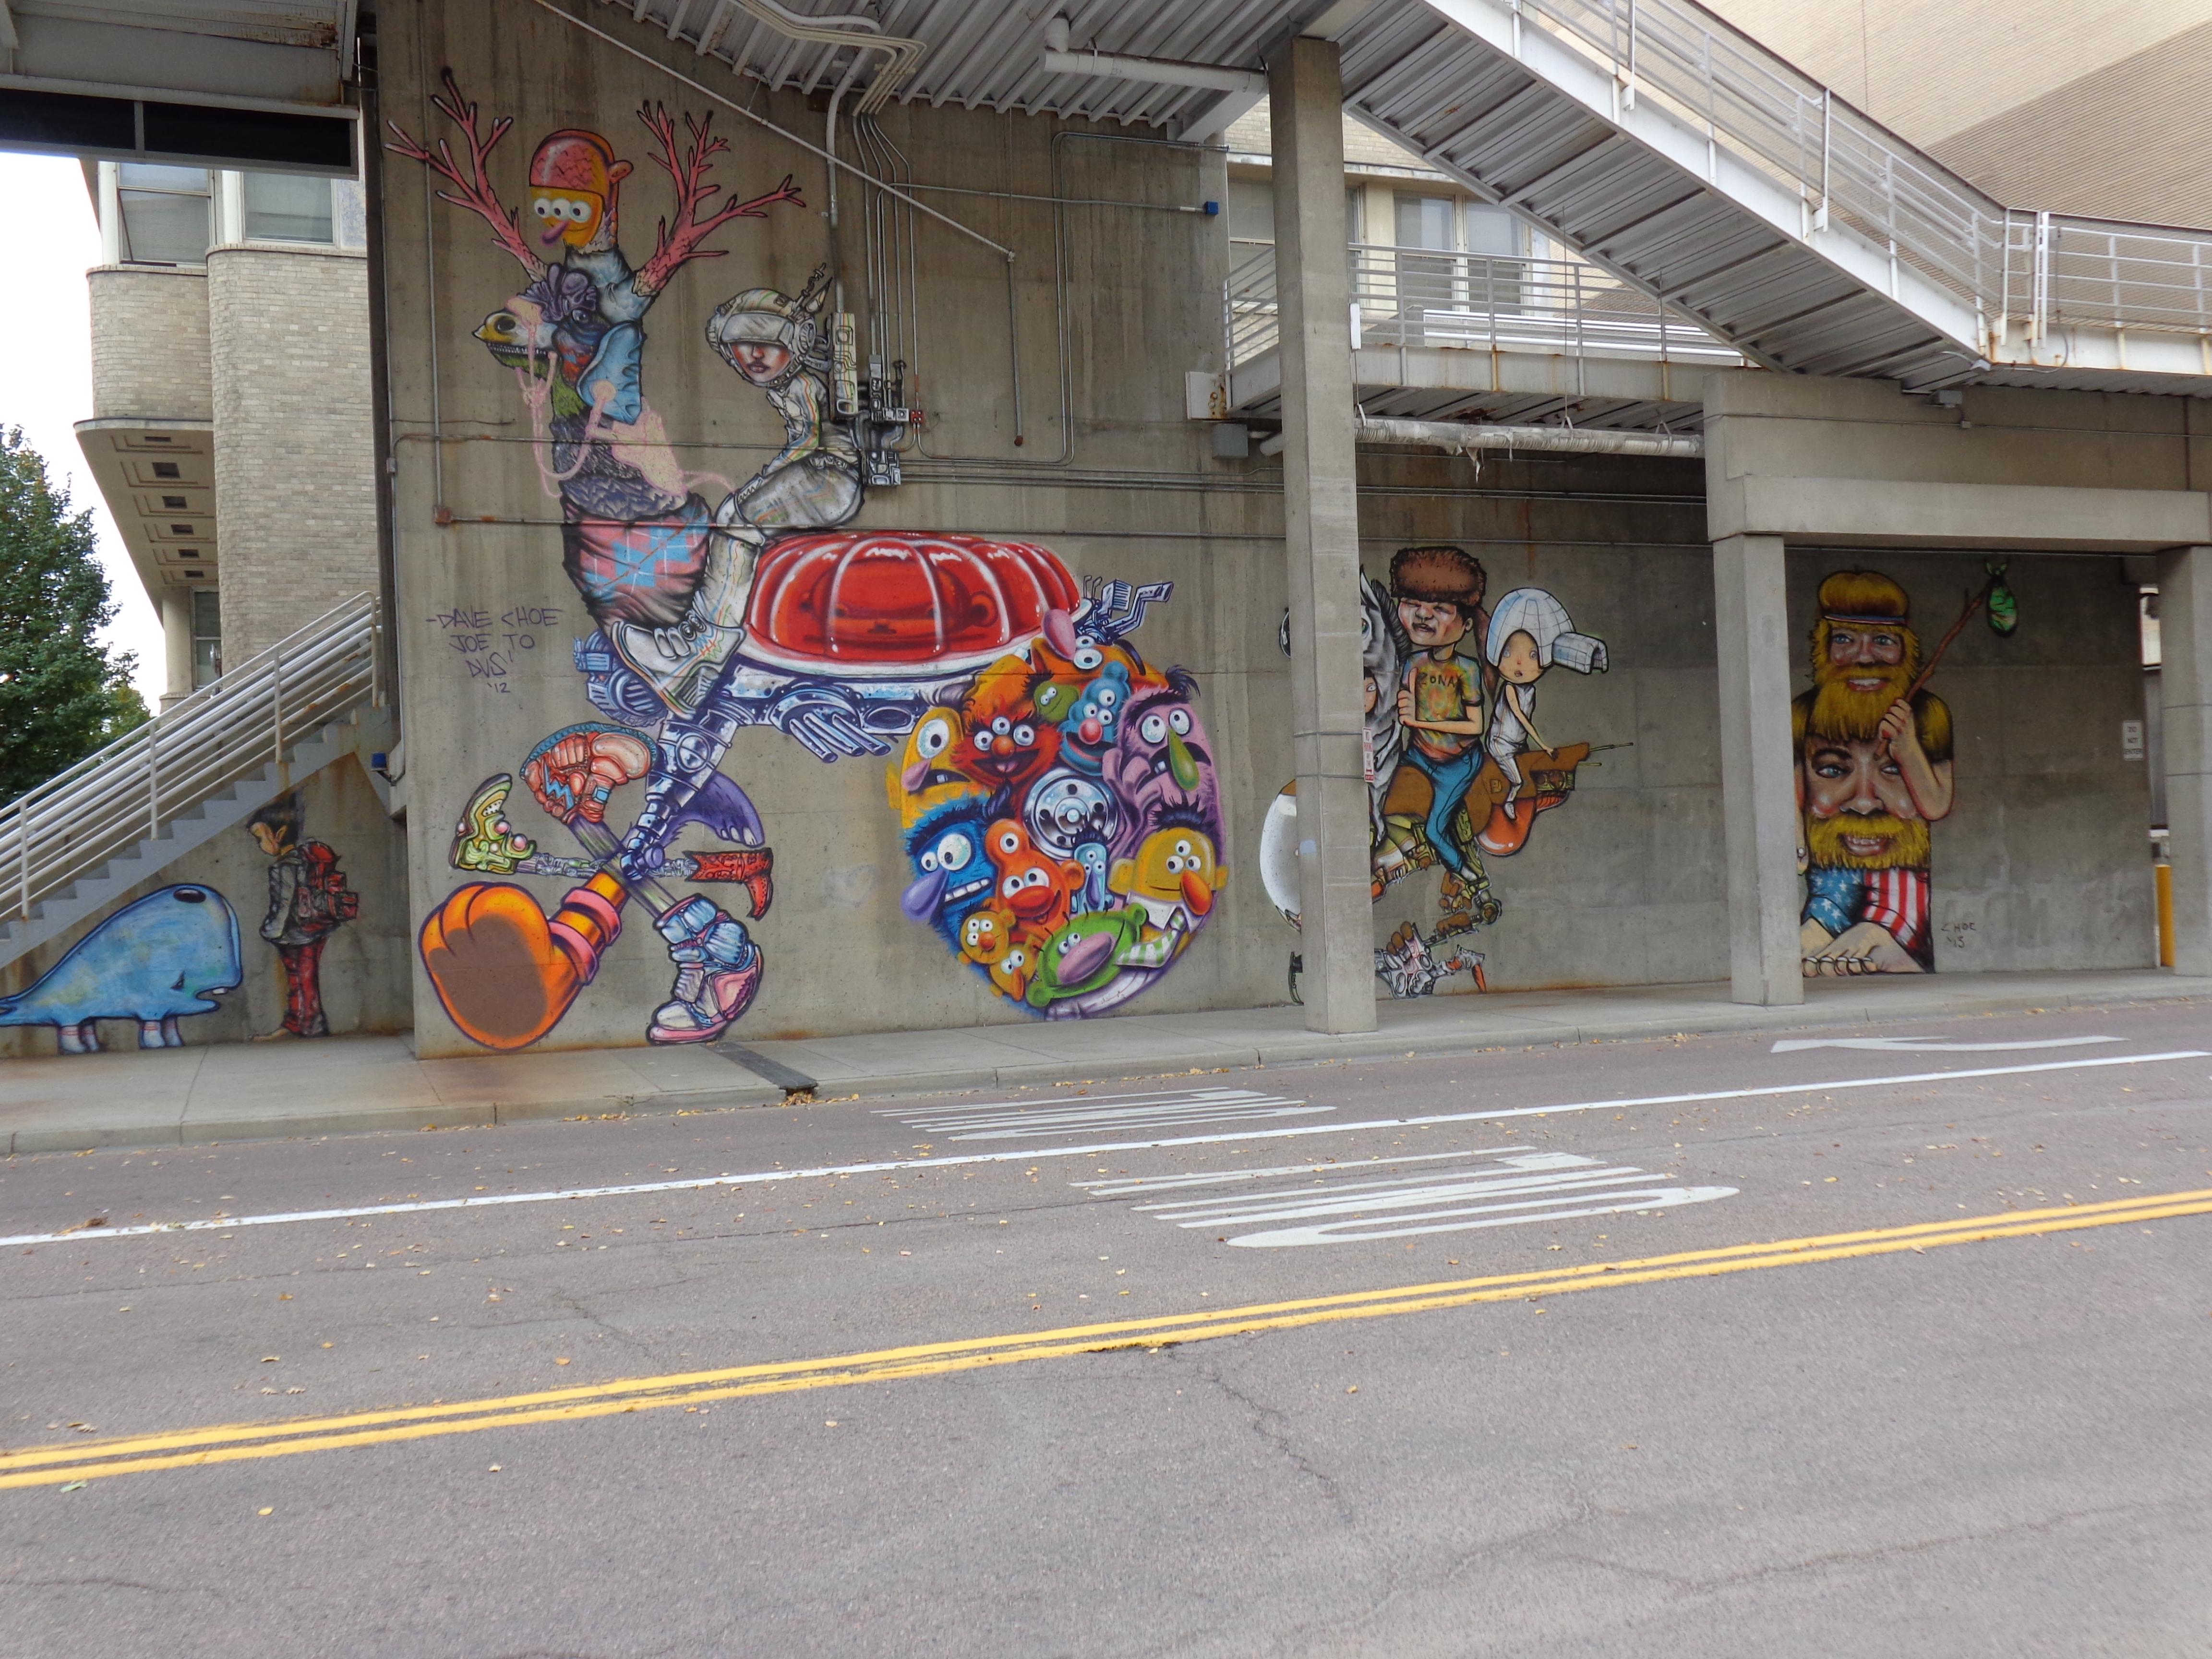 Unique street art in denver for Craft show denver convention center